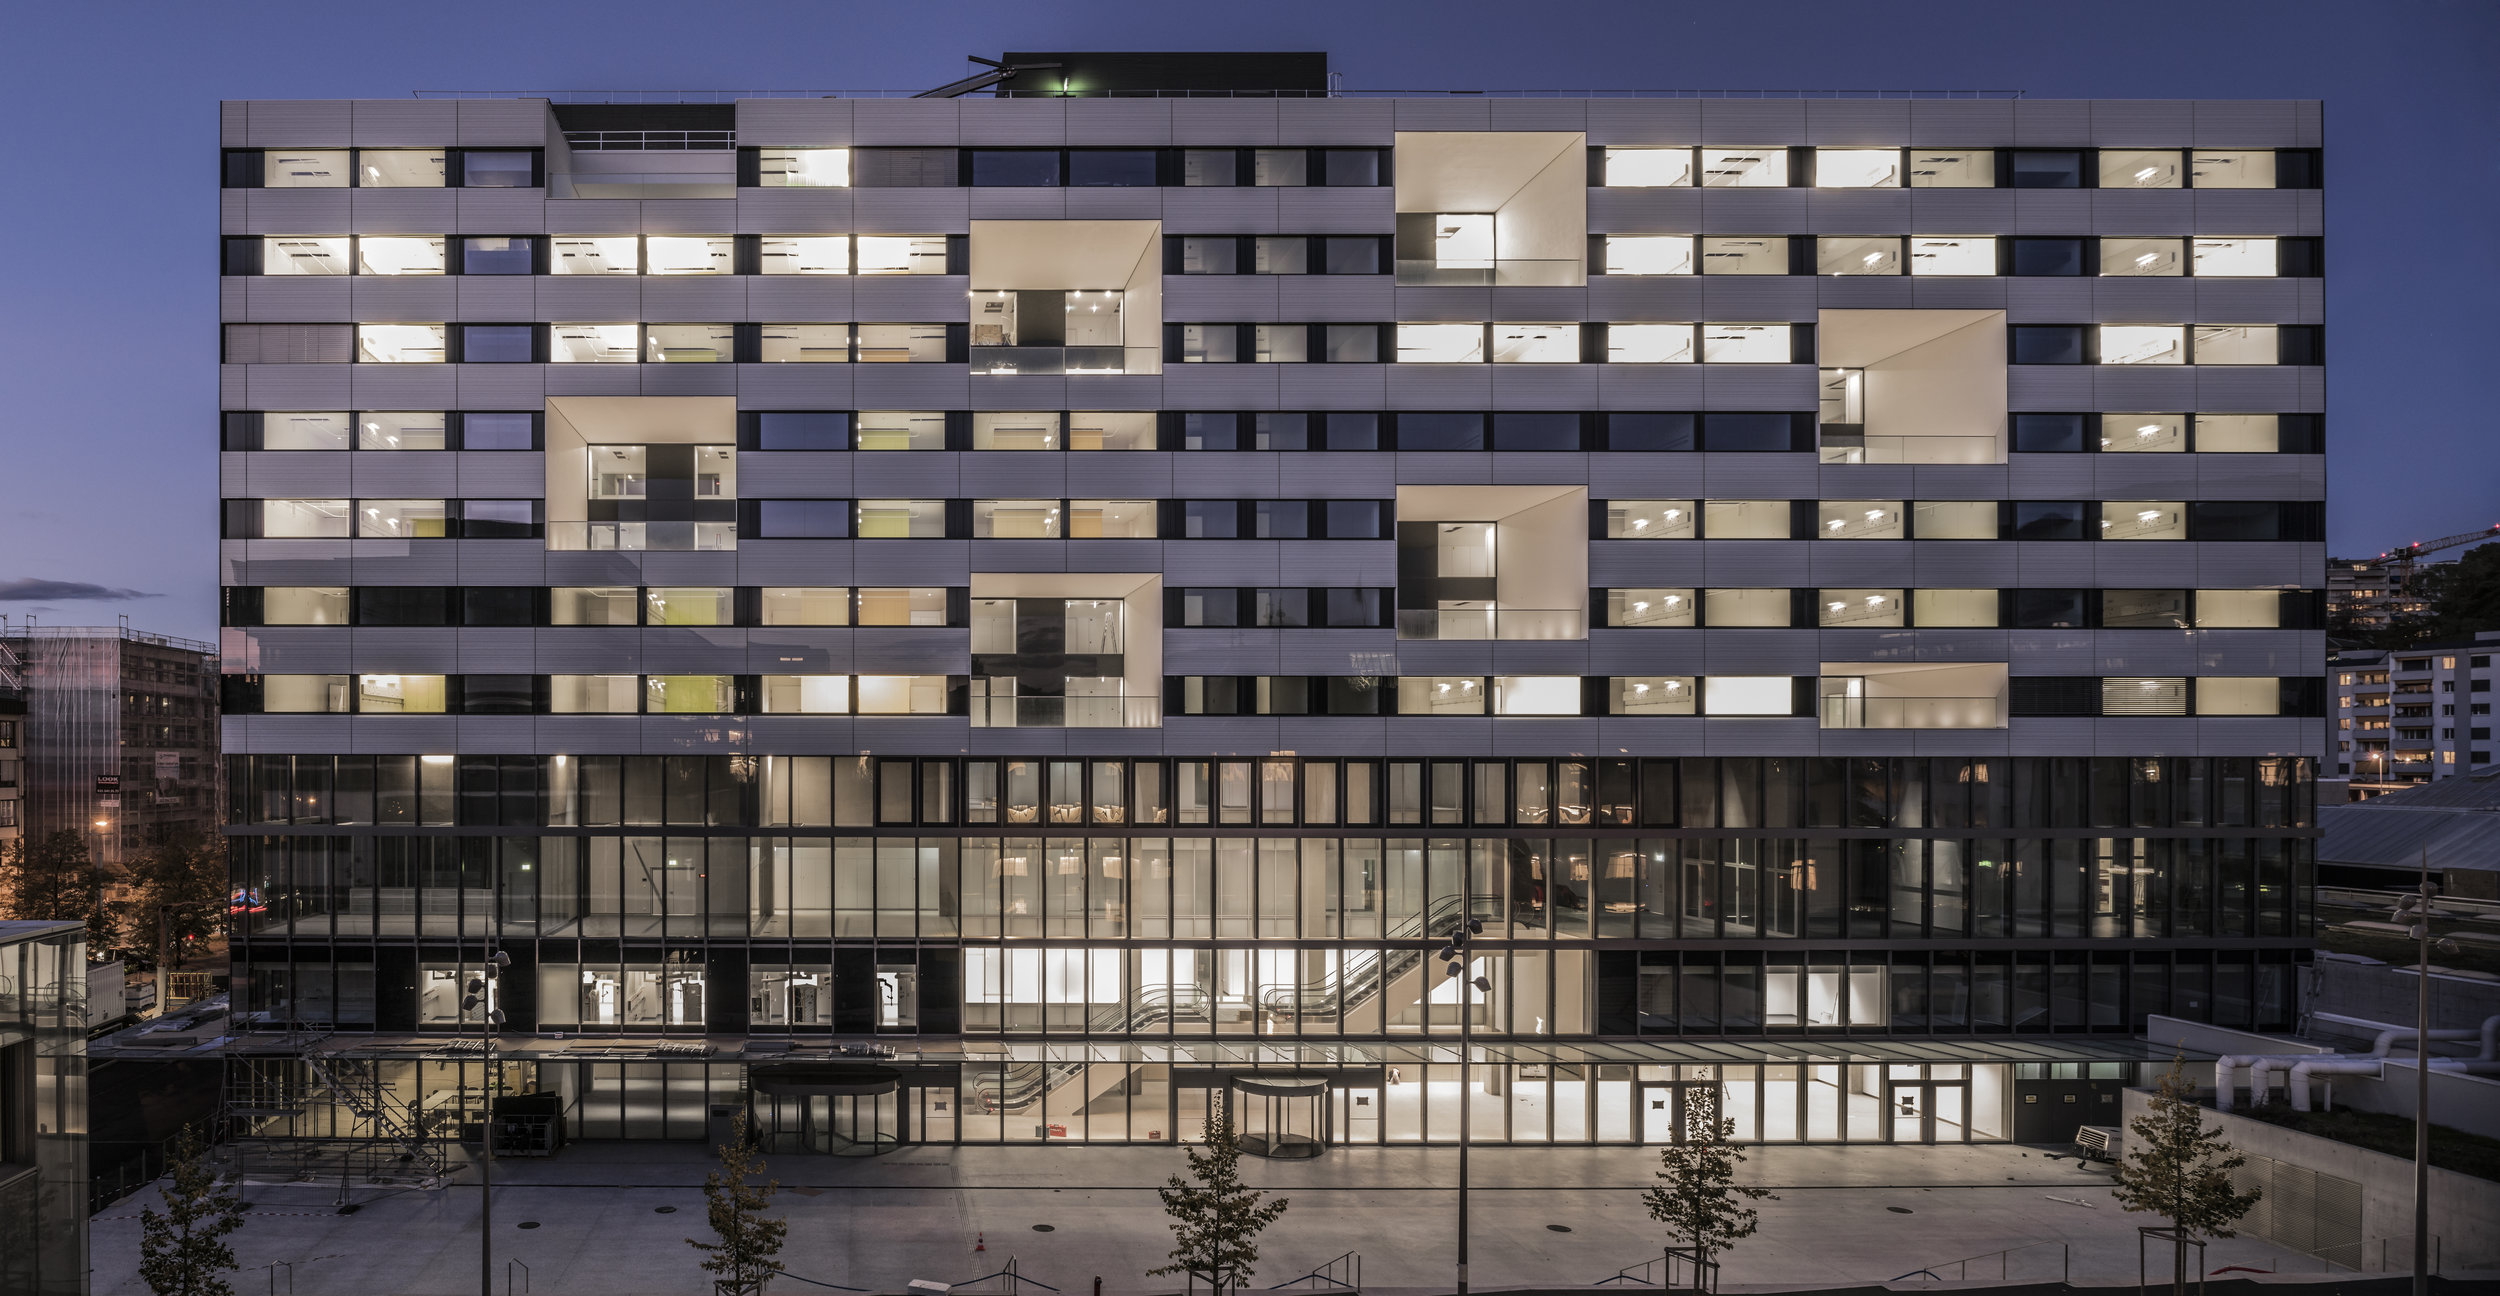 Brunet Saunier Architecture - Suisse - Genève - Hôpital  Universitaire- avec Odile Seyler & Jacques Lucan - Gerold Zimmerli ©Luca Fascini.jpg